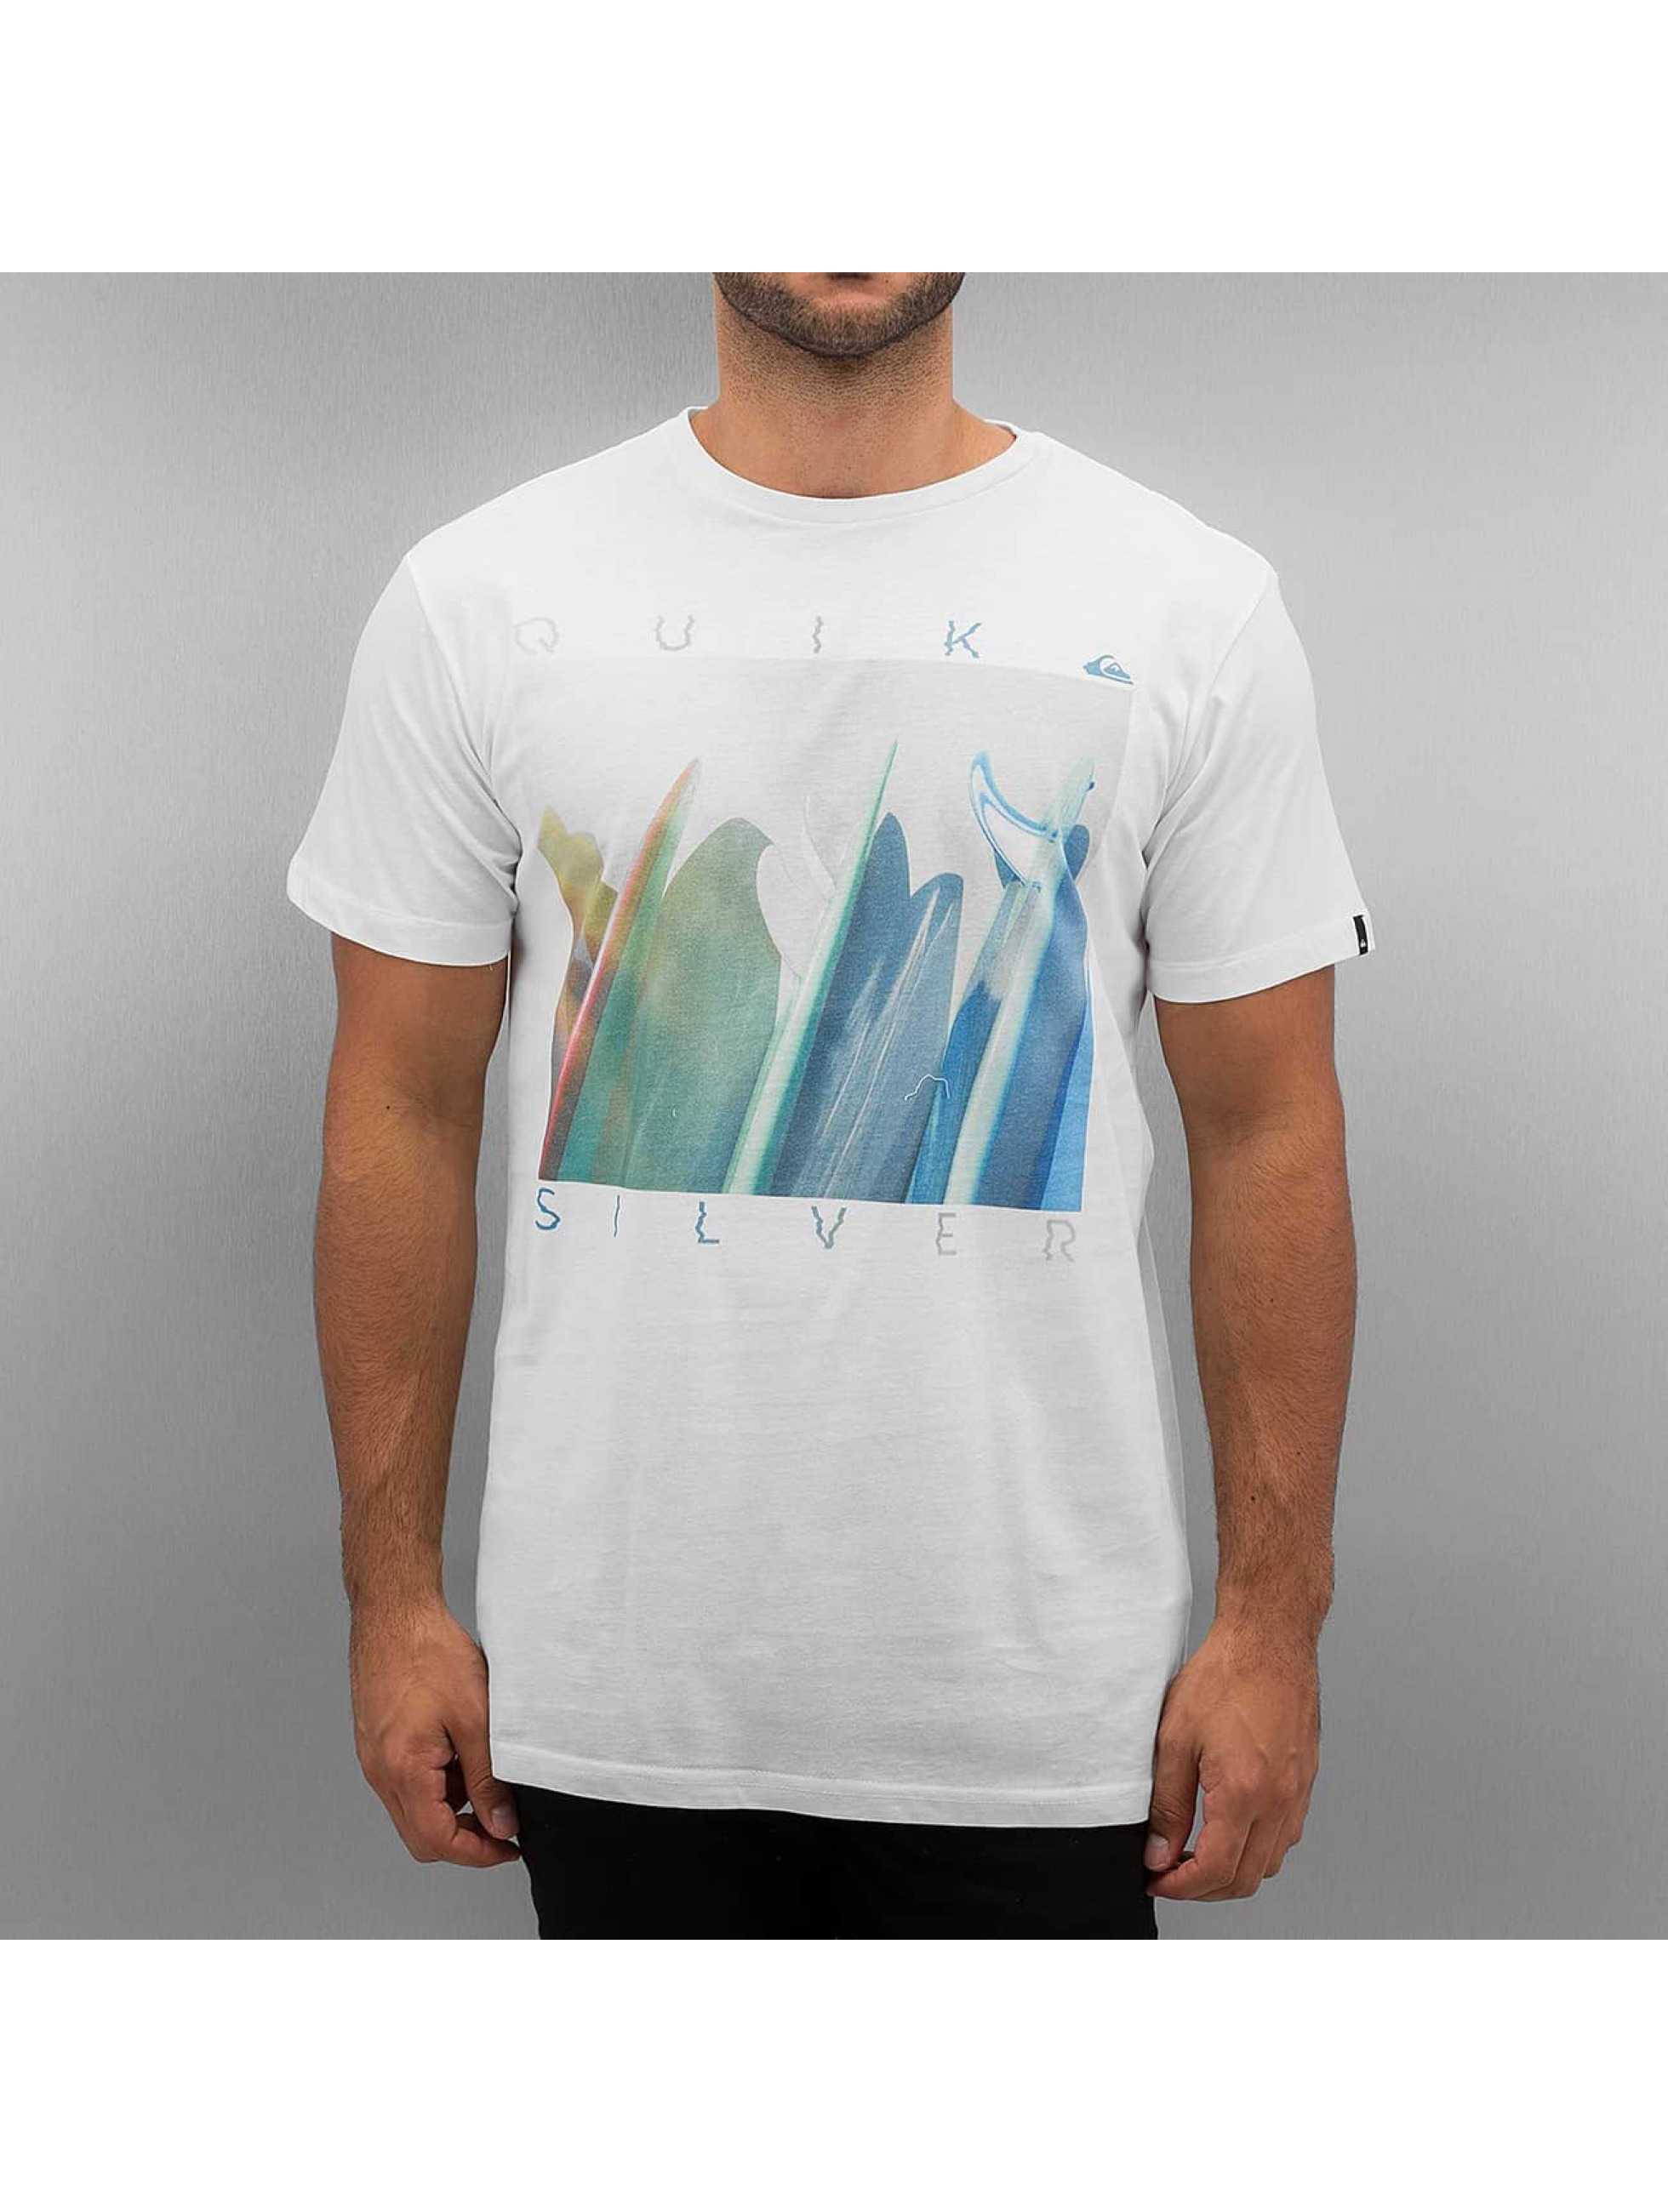 Quiksilver T-shirt Classic Mugshot vit